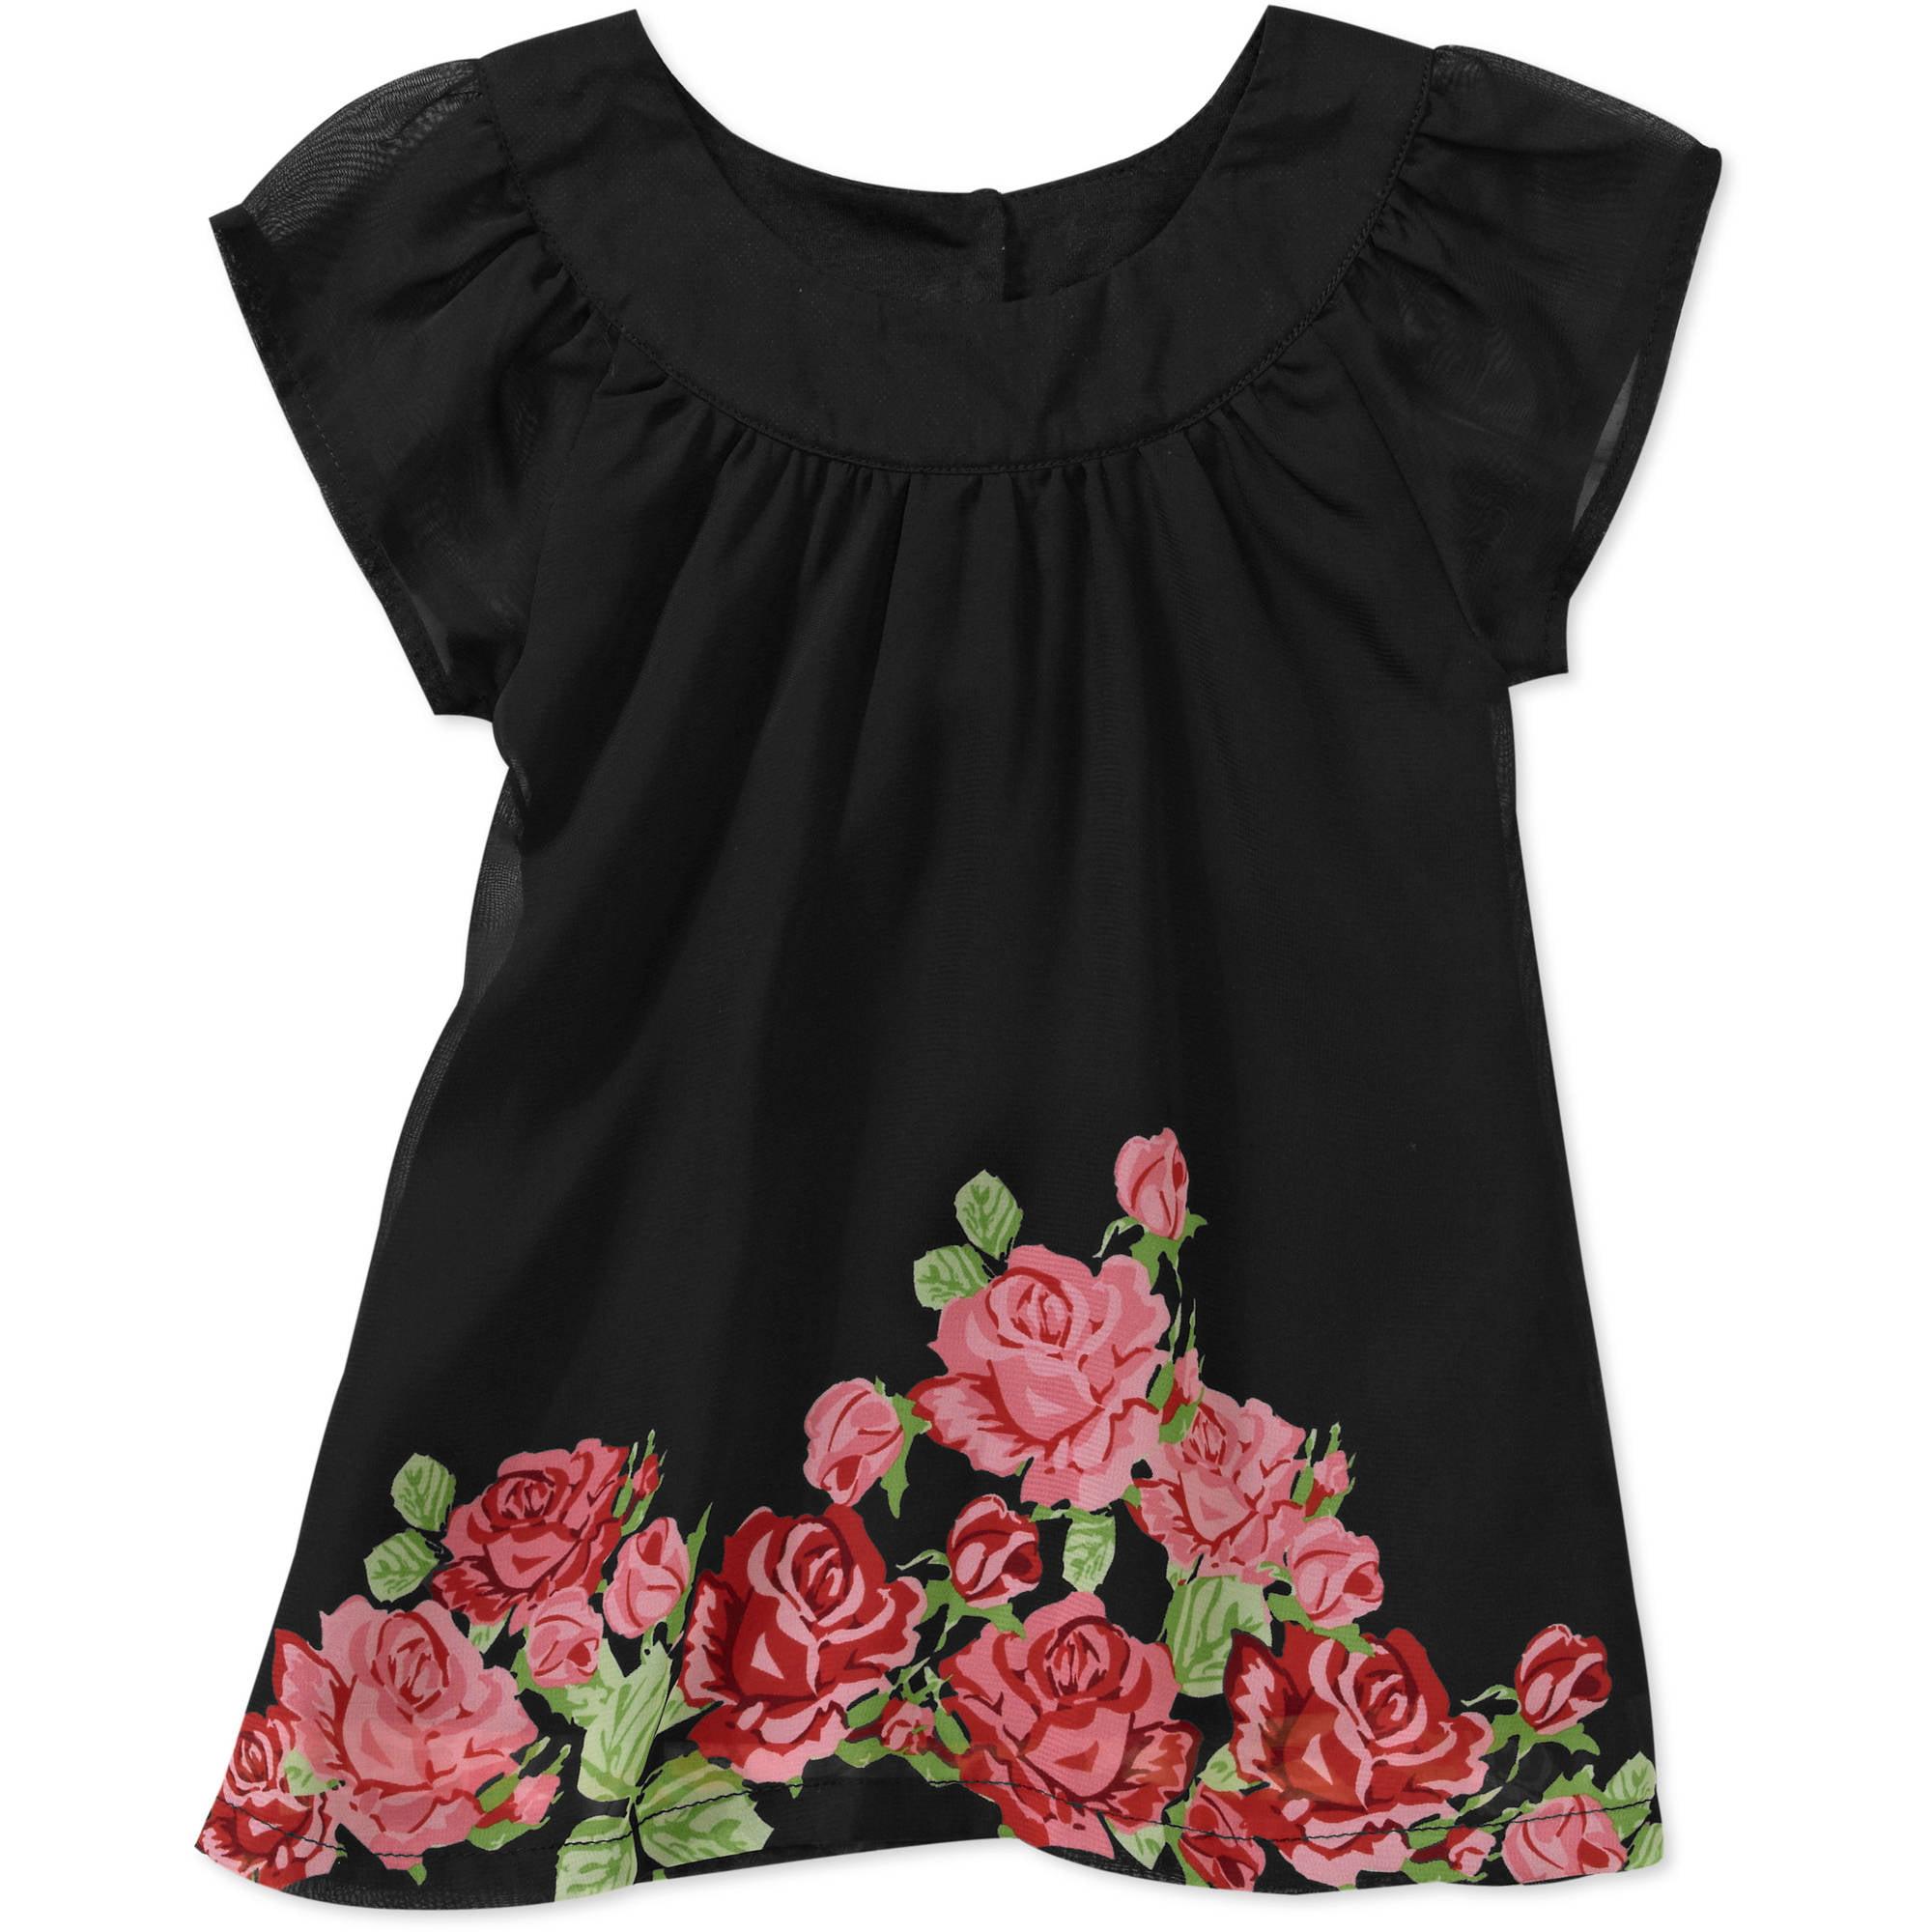 George Baby Girls' Floral Chiffon Print Dress